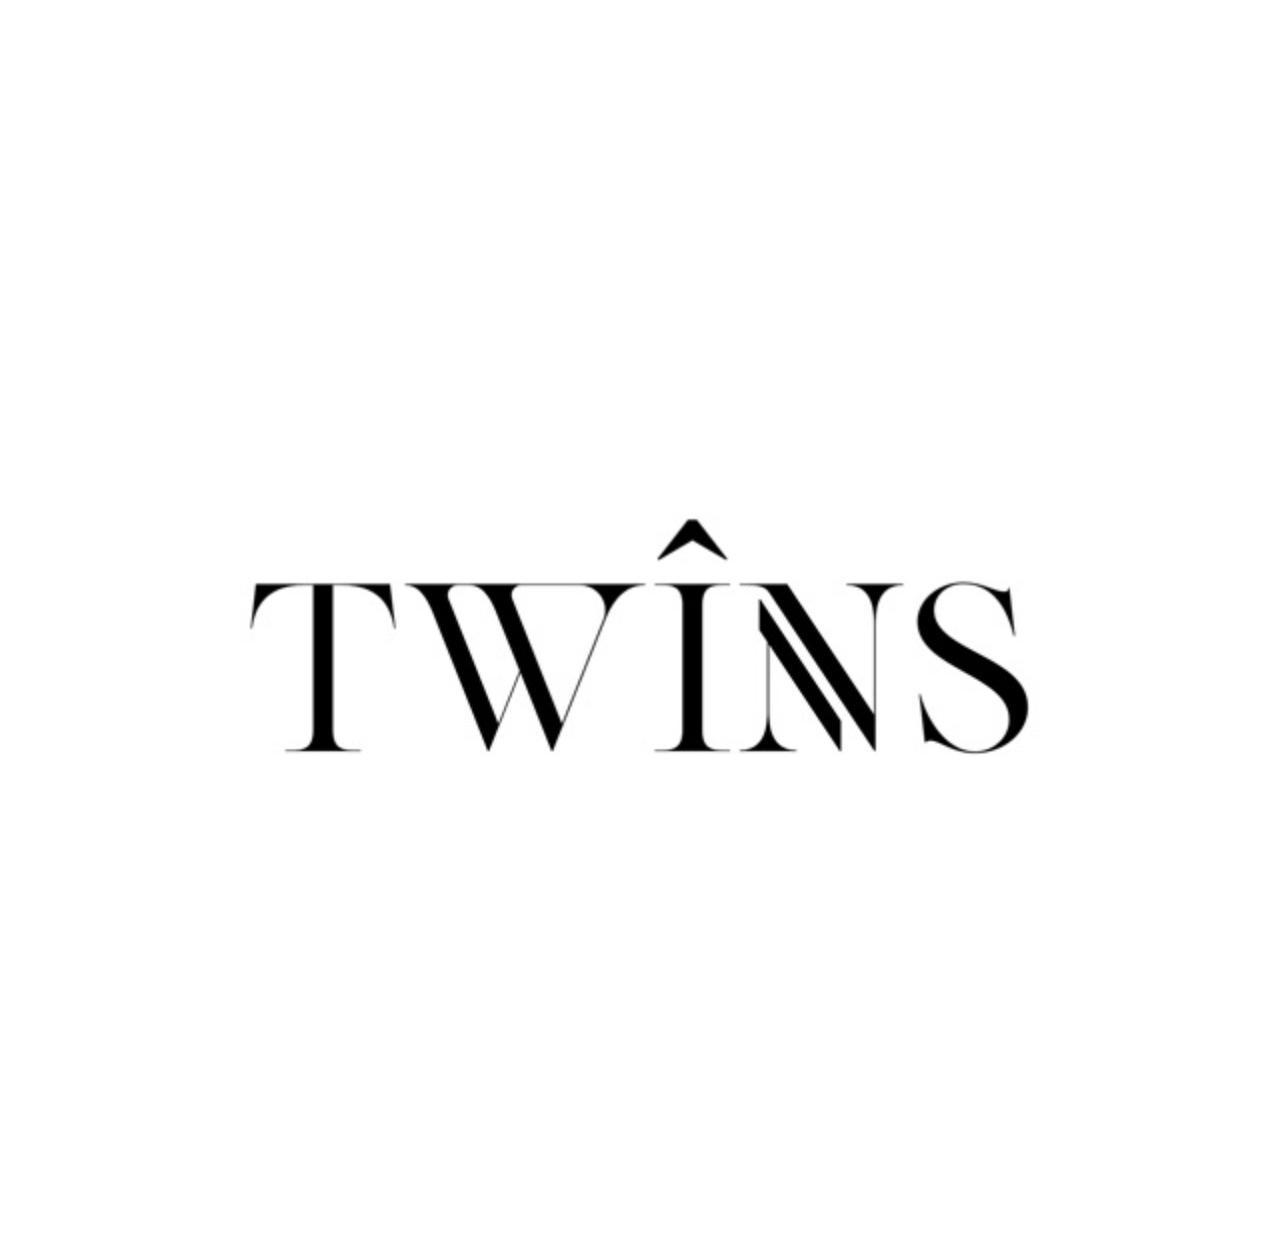 Twins design